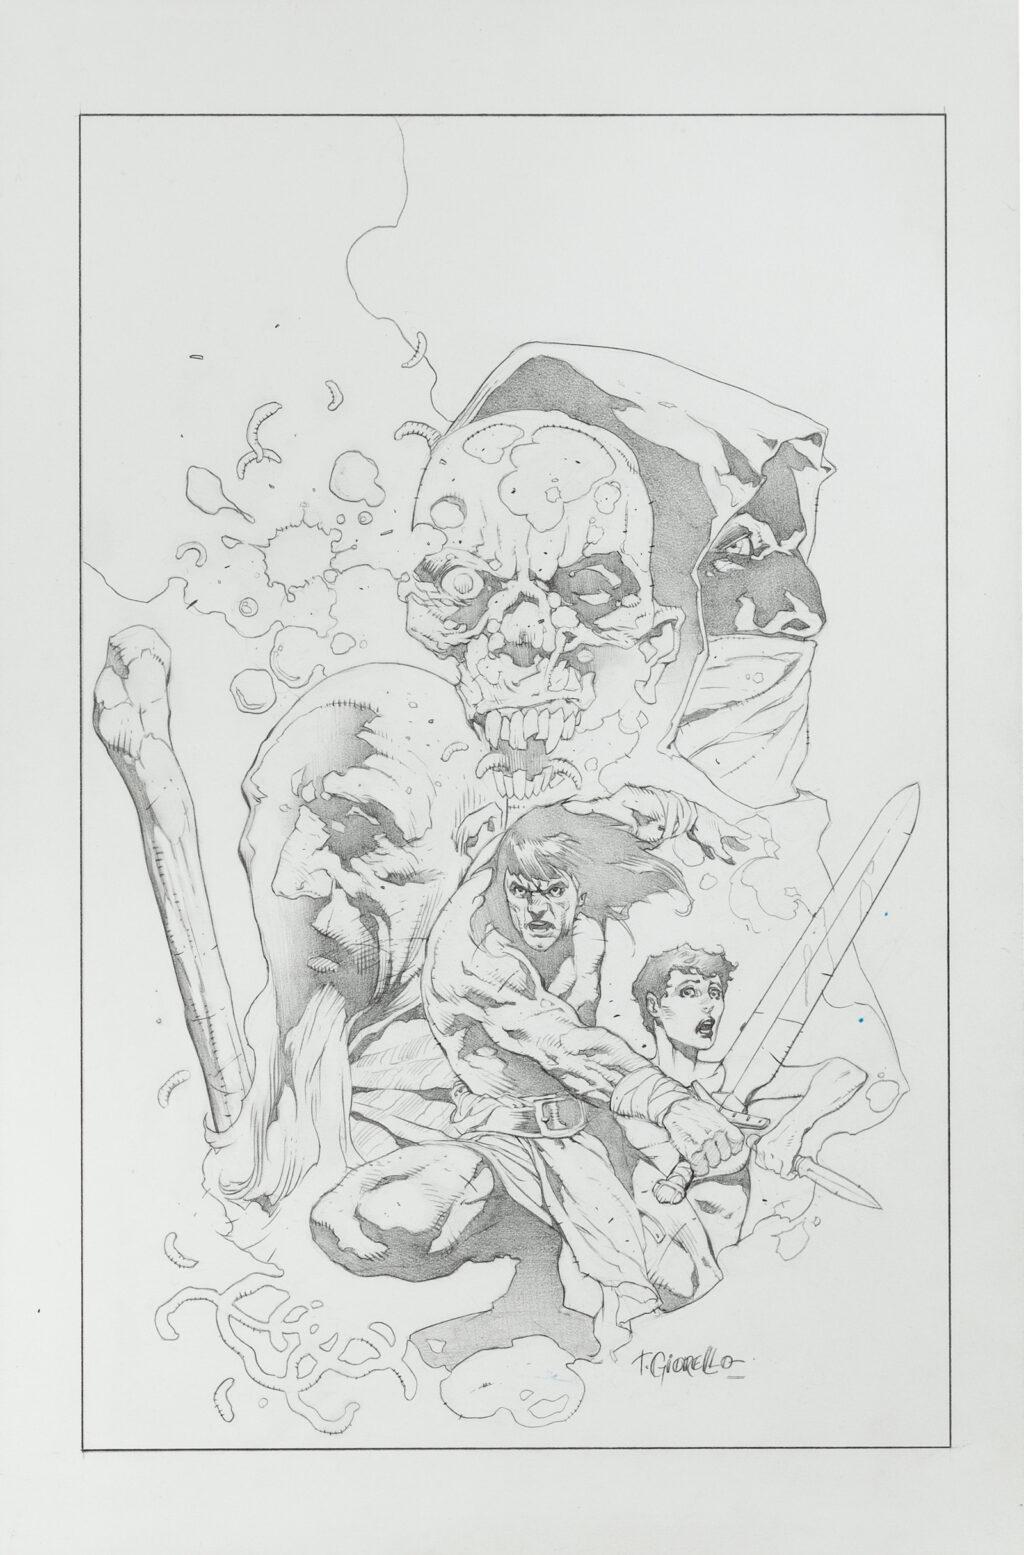 Conan issue 48 cover by Tomas Giorello